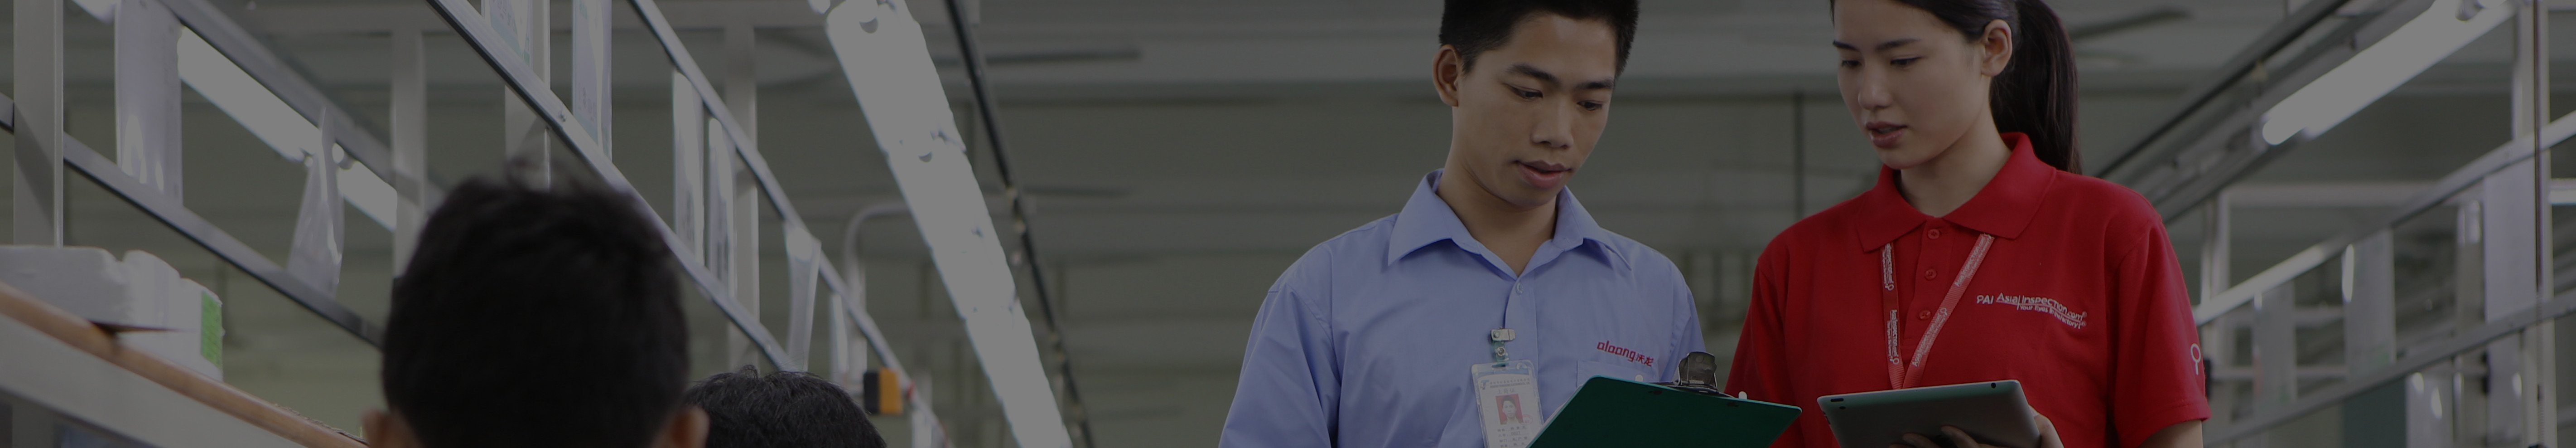 Supplier Quality Audit Program | QIMA – Supply Chain Audits